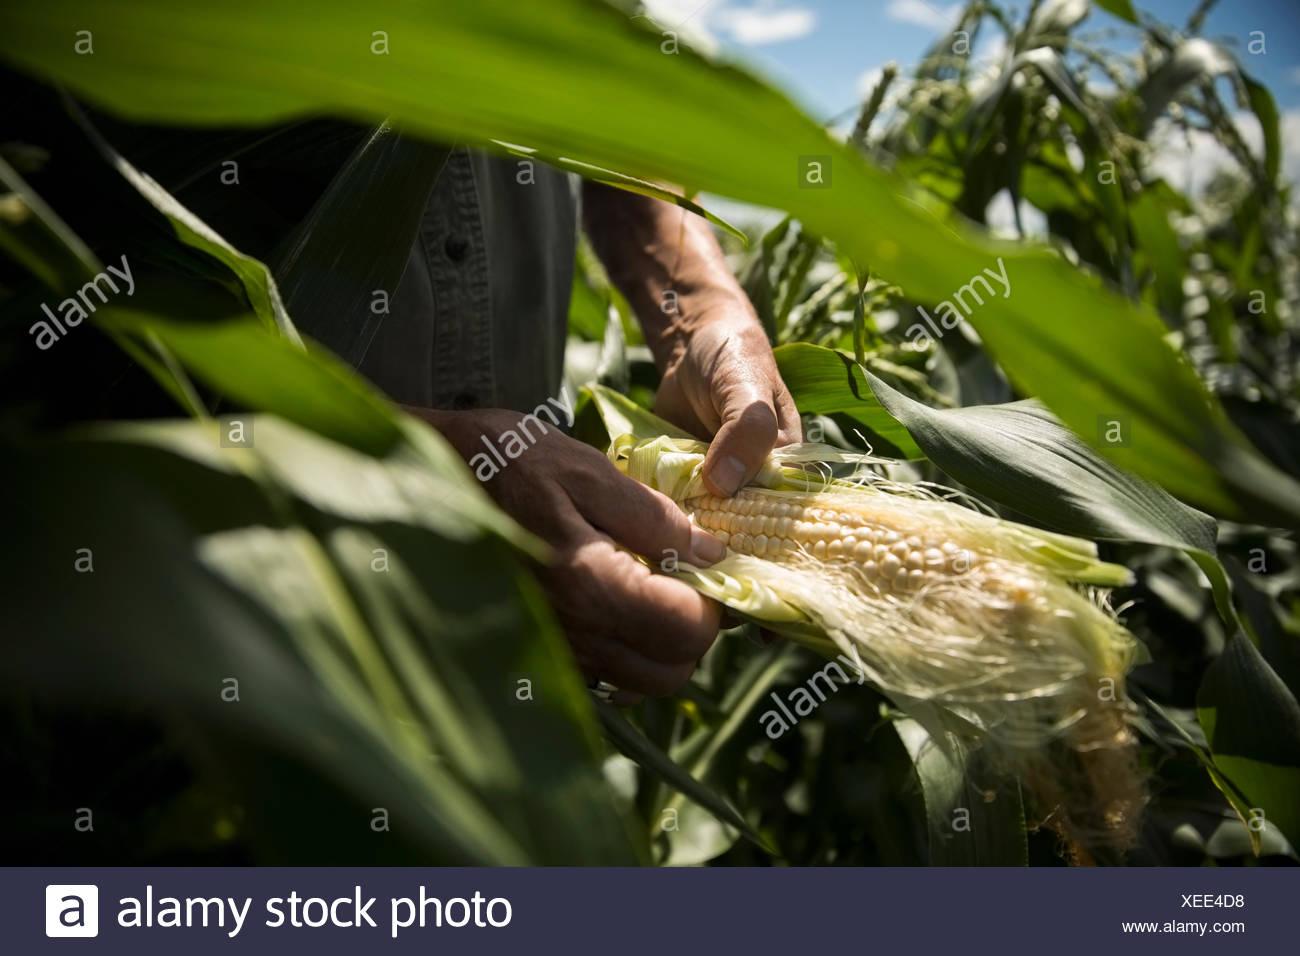 Farmer inspecting corn cob - Stock Image